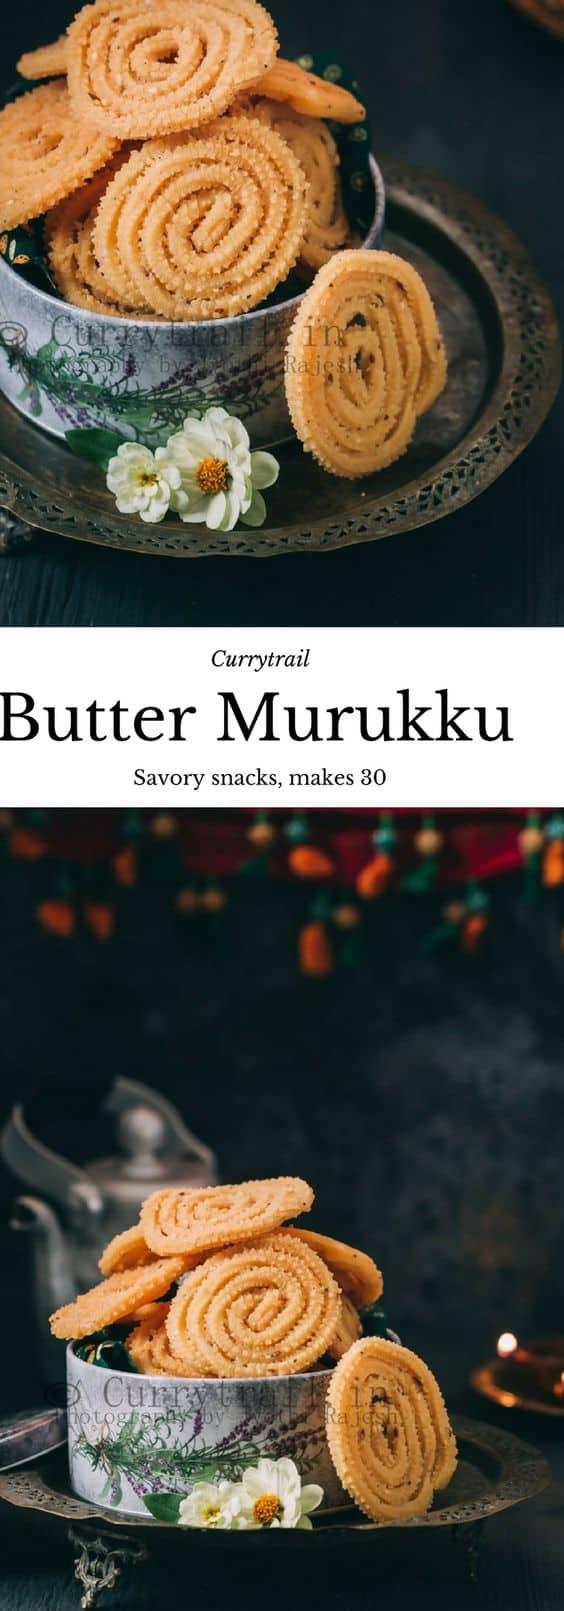 butter murukku recipe with text overlay